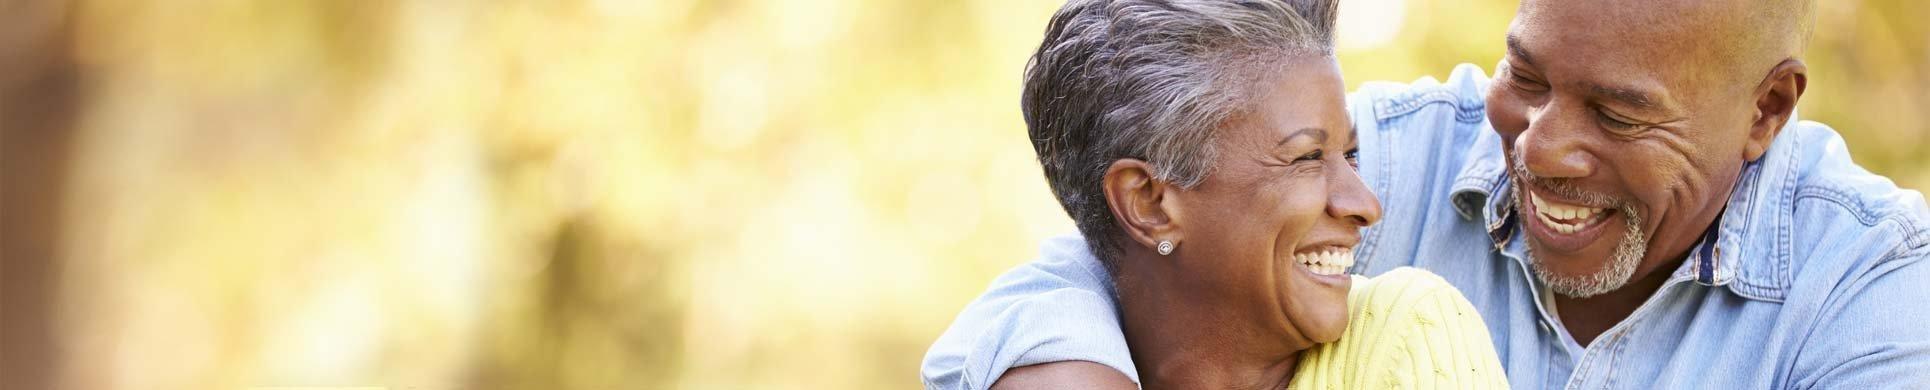 Symptoms Of Diabetes Type 1 In Adults